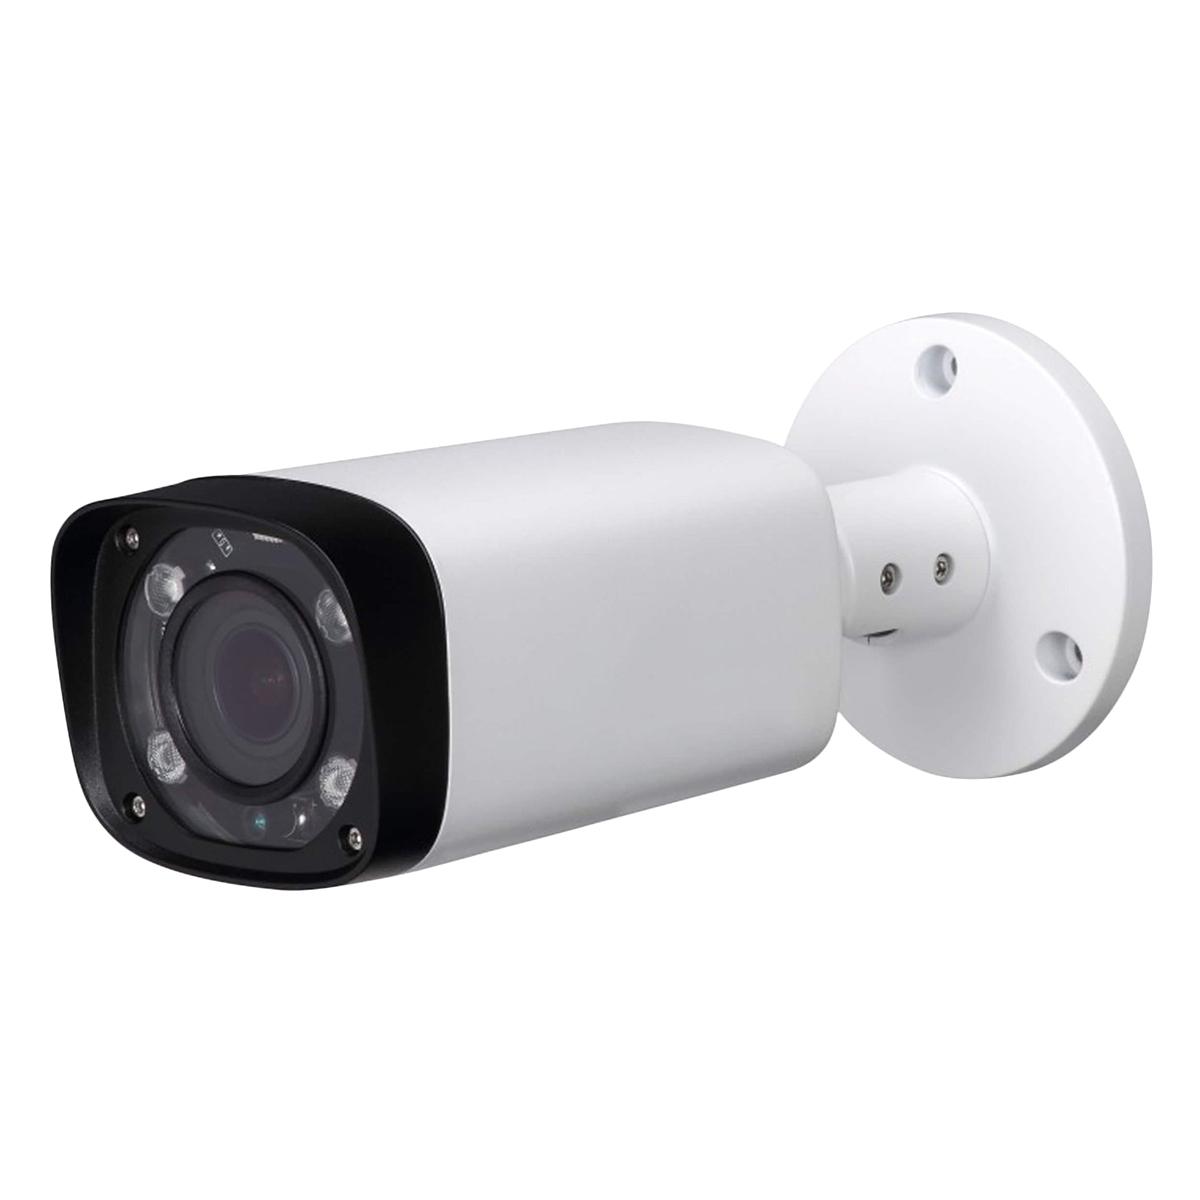 Camera IP KBVISION 1.3 Mp (KX-1305N)